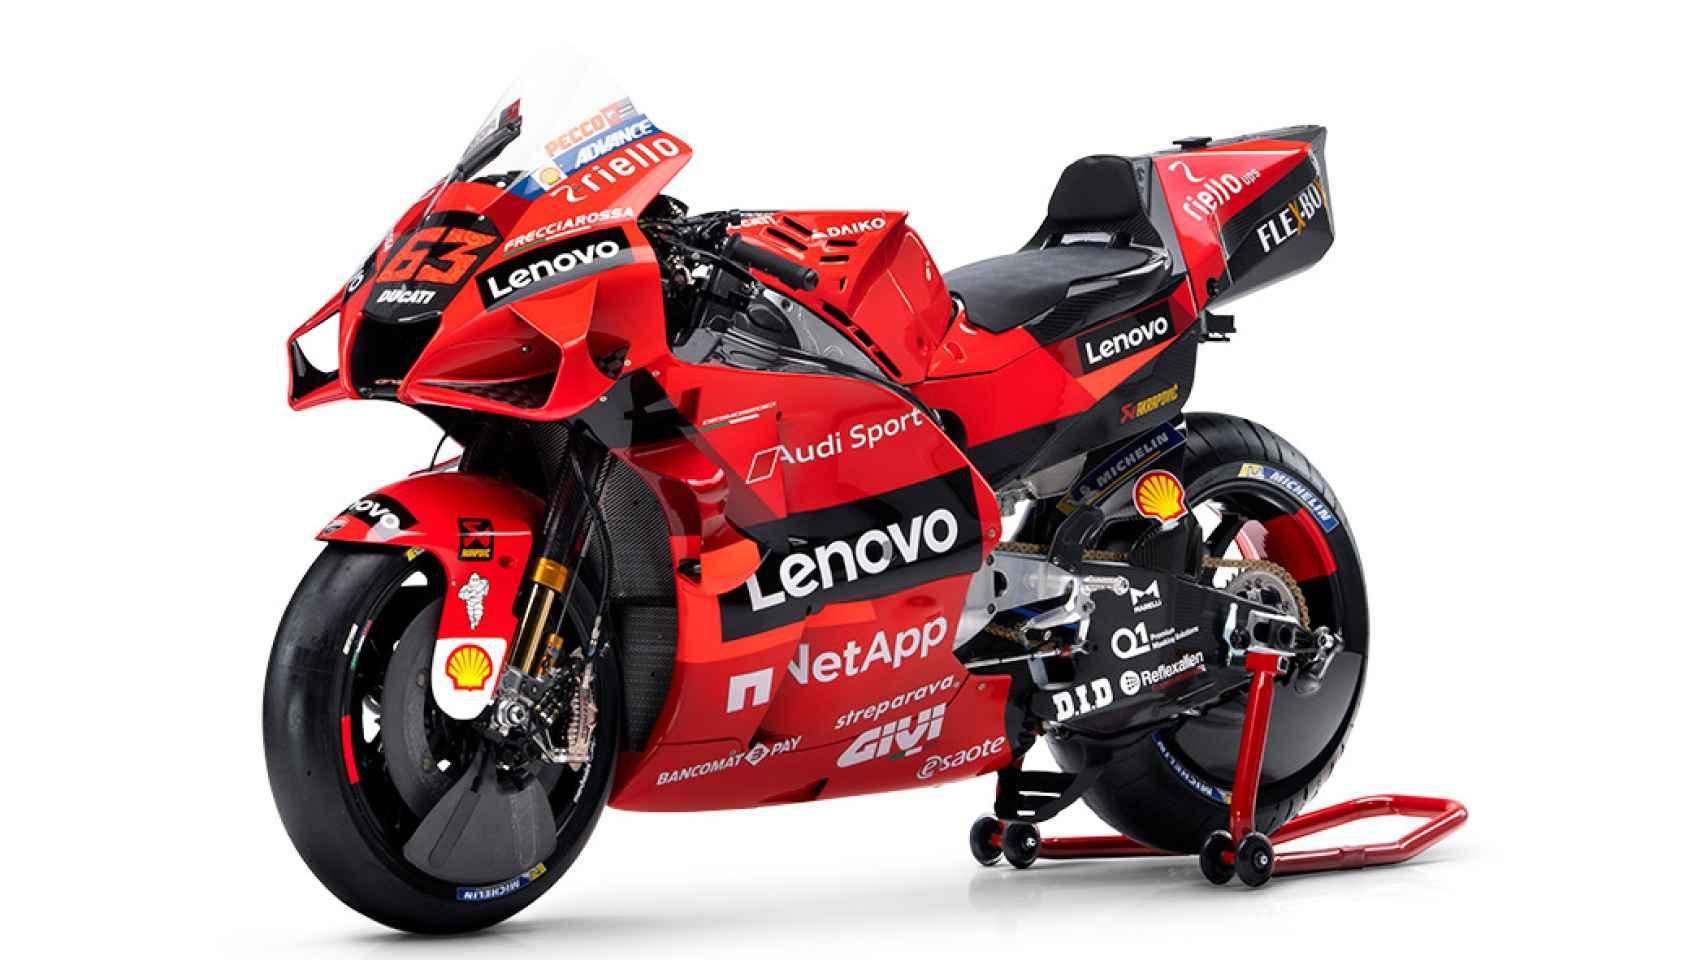 La nueva moto del Equipo Ducati Lenovo